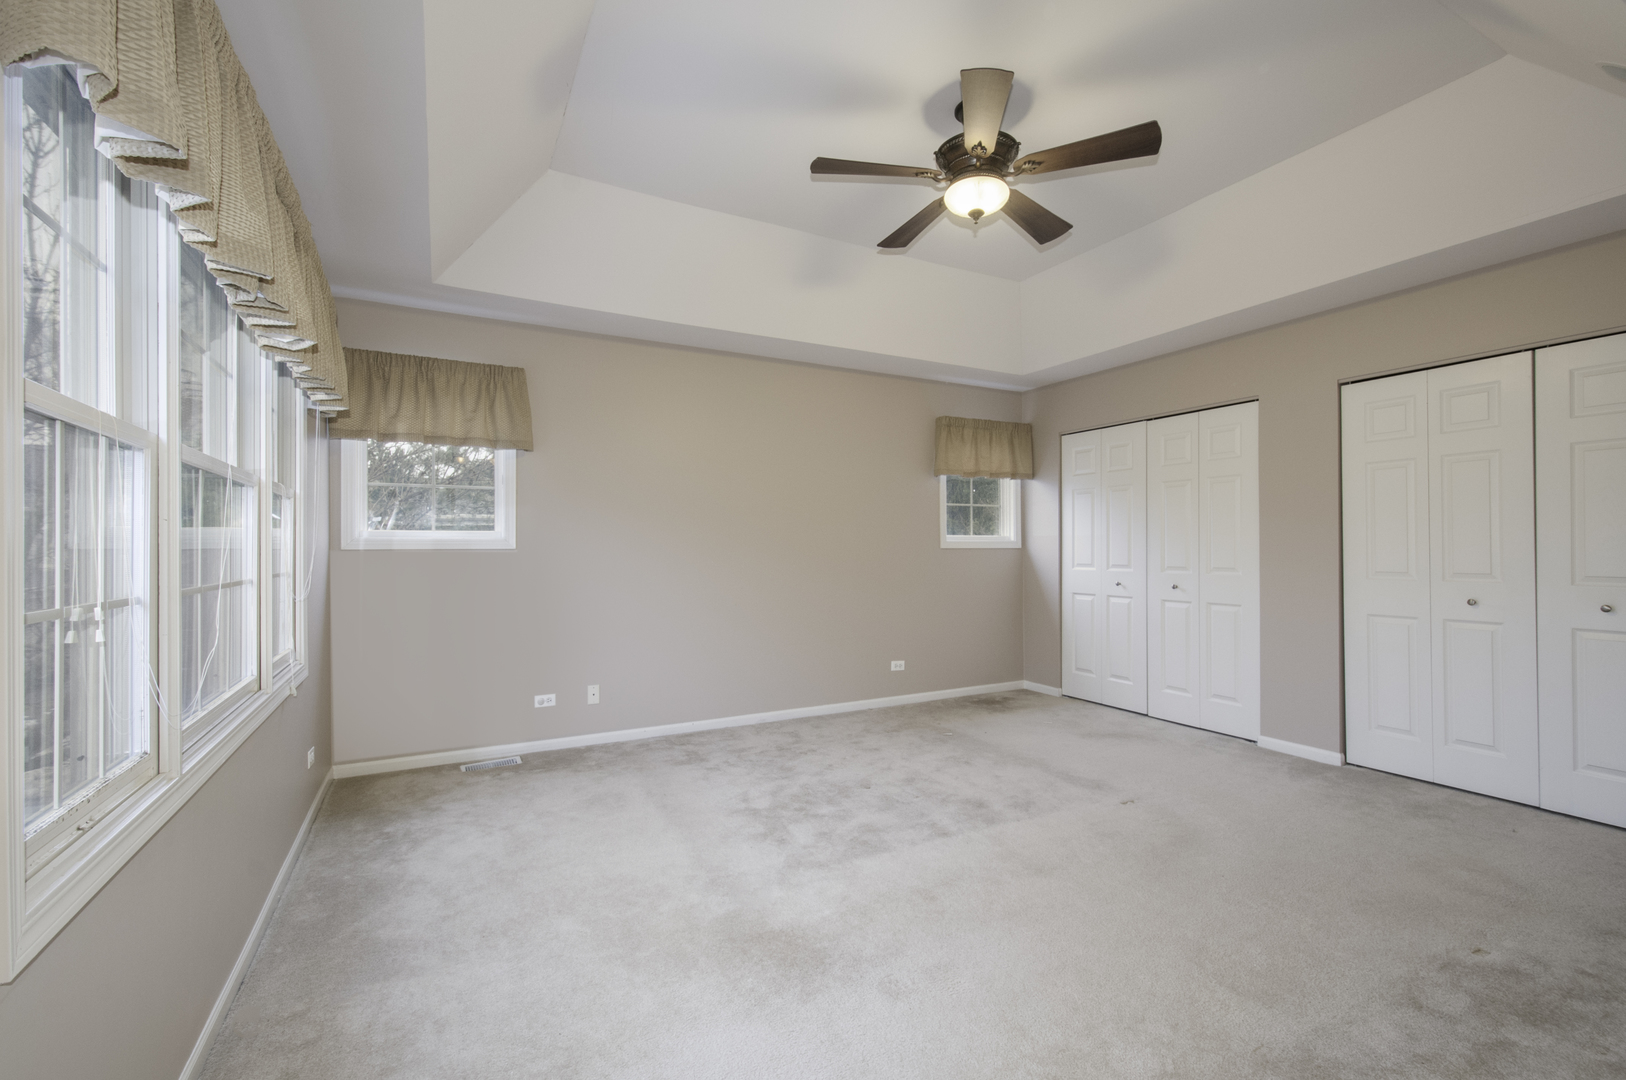 215 WILDFLOWER, La Grange, Illinois, 60525